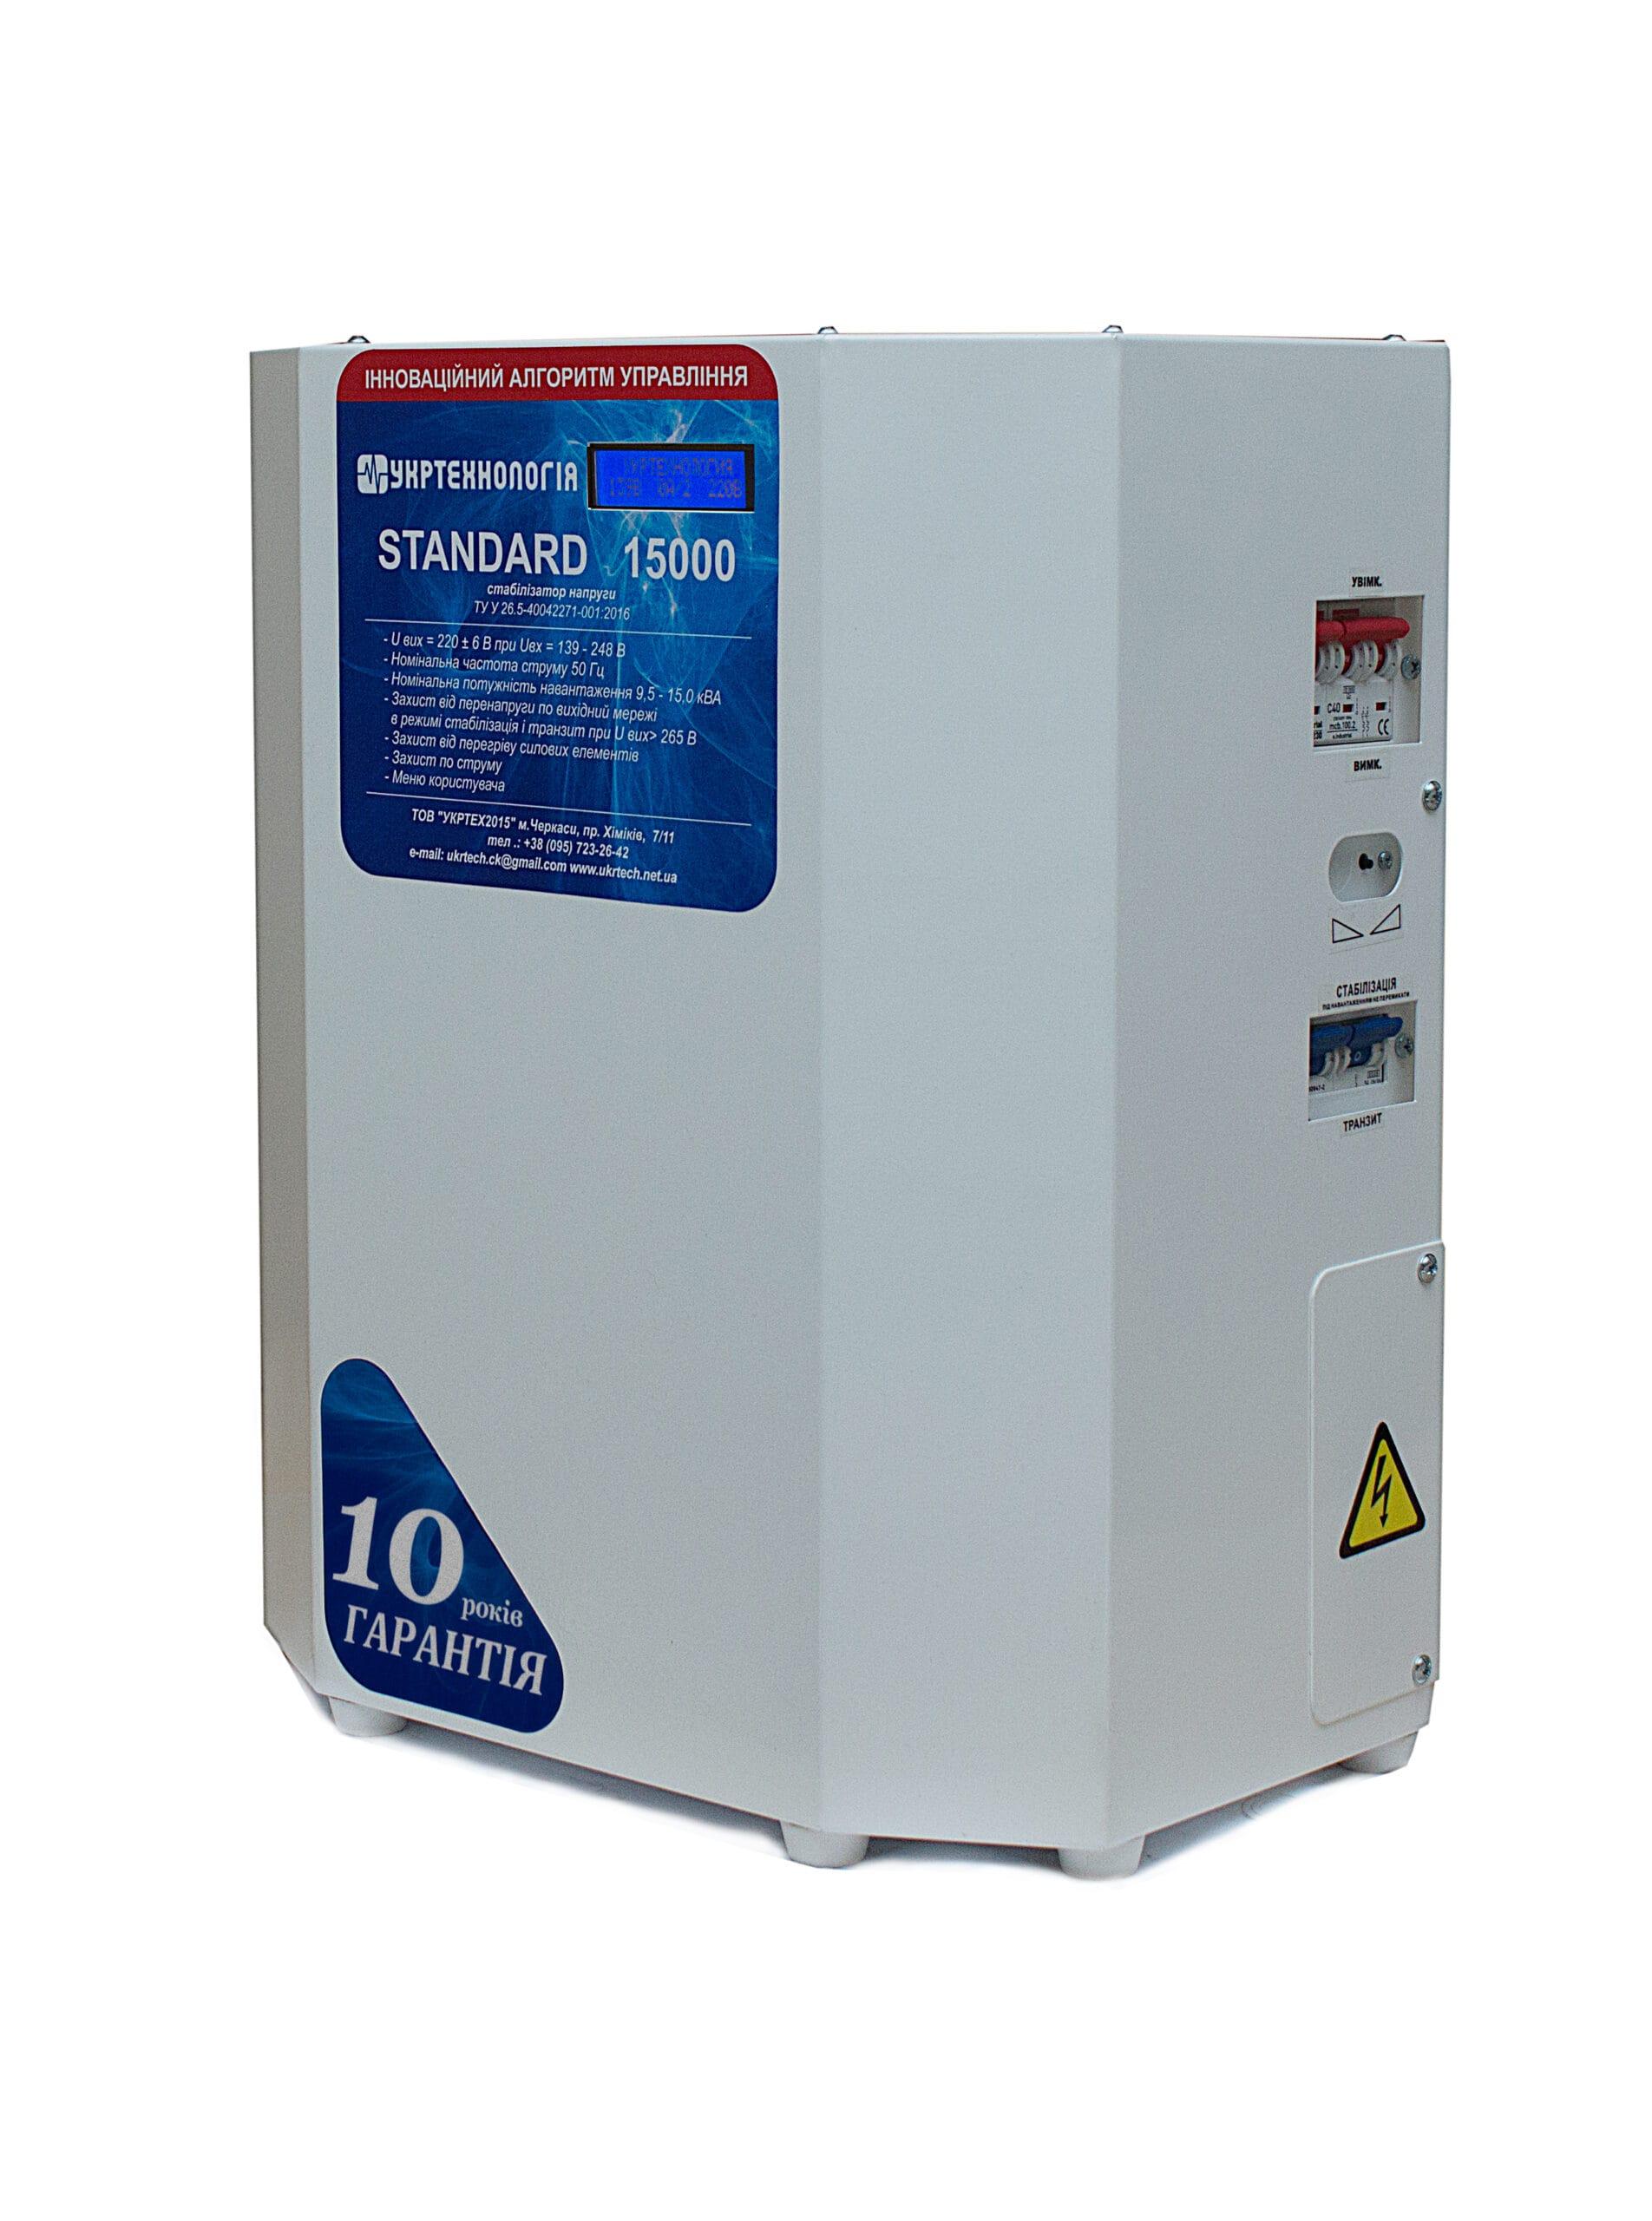 Стабилизаторы напряжения - Стабилизатор напряжения 15 кВт STANDARD  000001400 - Фото 1